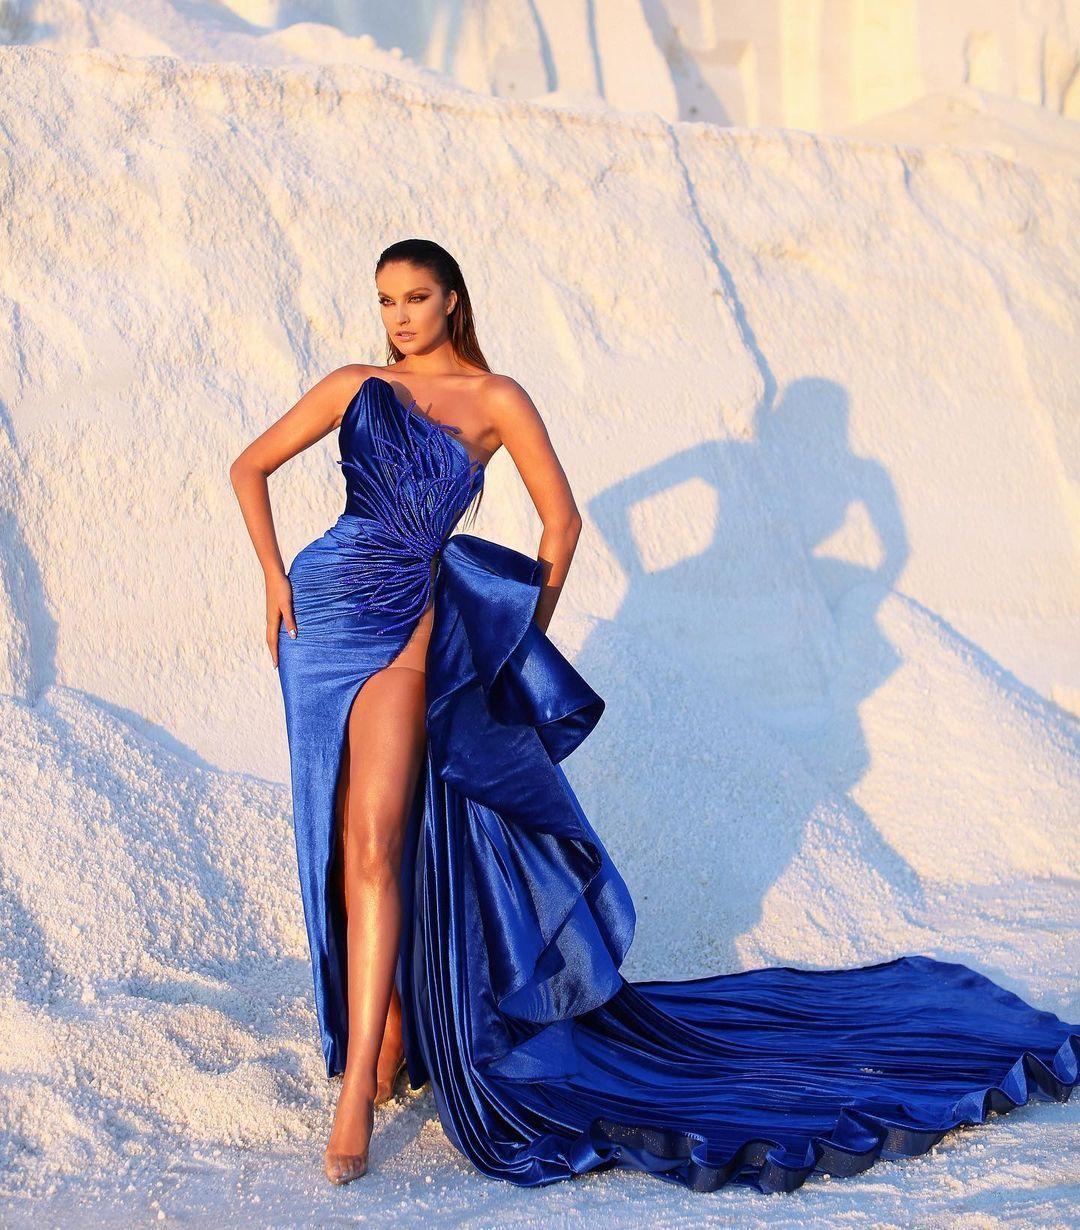 L E N A B E R I S H A On Instagram Iceberg Lena Berisha F W 20 Oriolamarashi Juxhinkurti Bardhakolgeci Mua Egzon In 2021 Event Dresses Gowns Dresses Ball Dresses